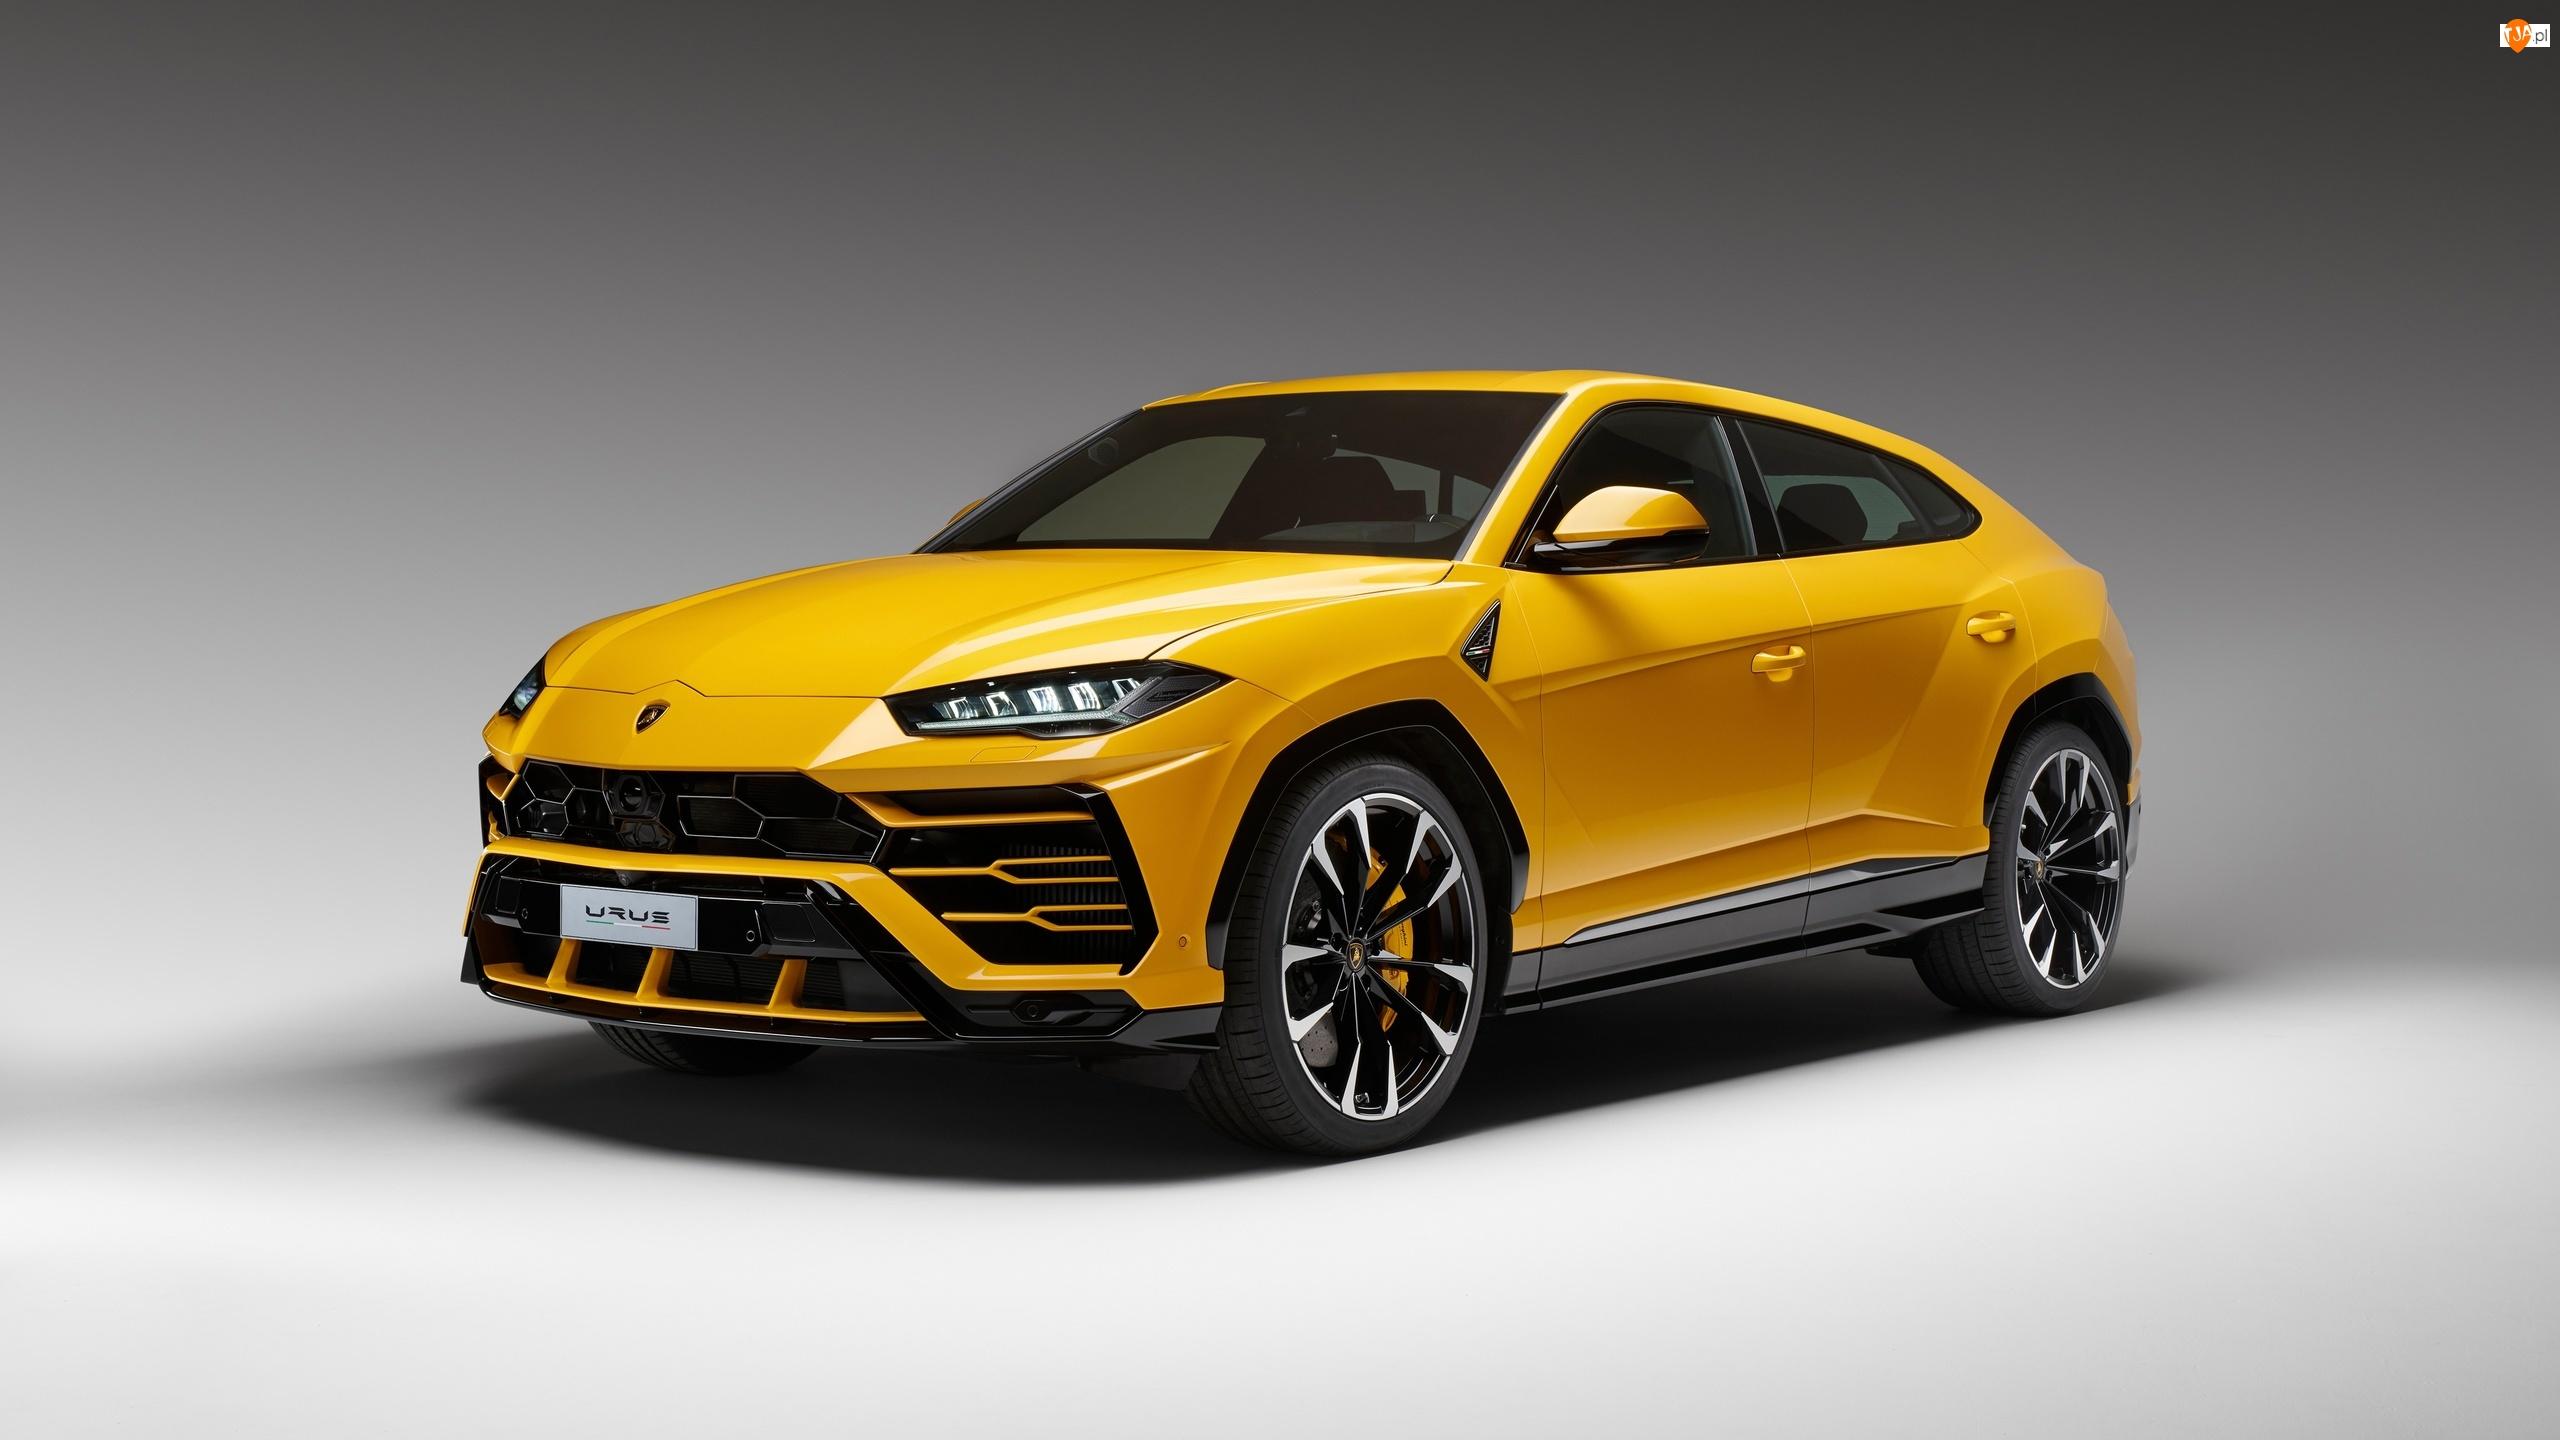 2018, Żółte, Lamborghini Urus, SUV